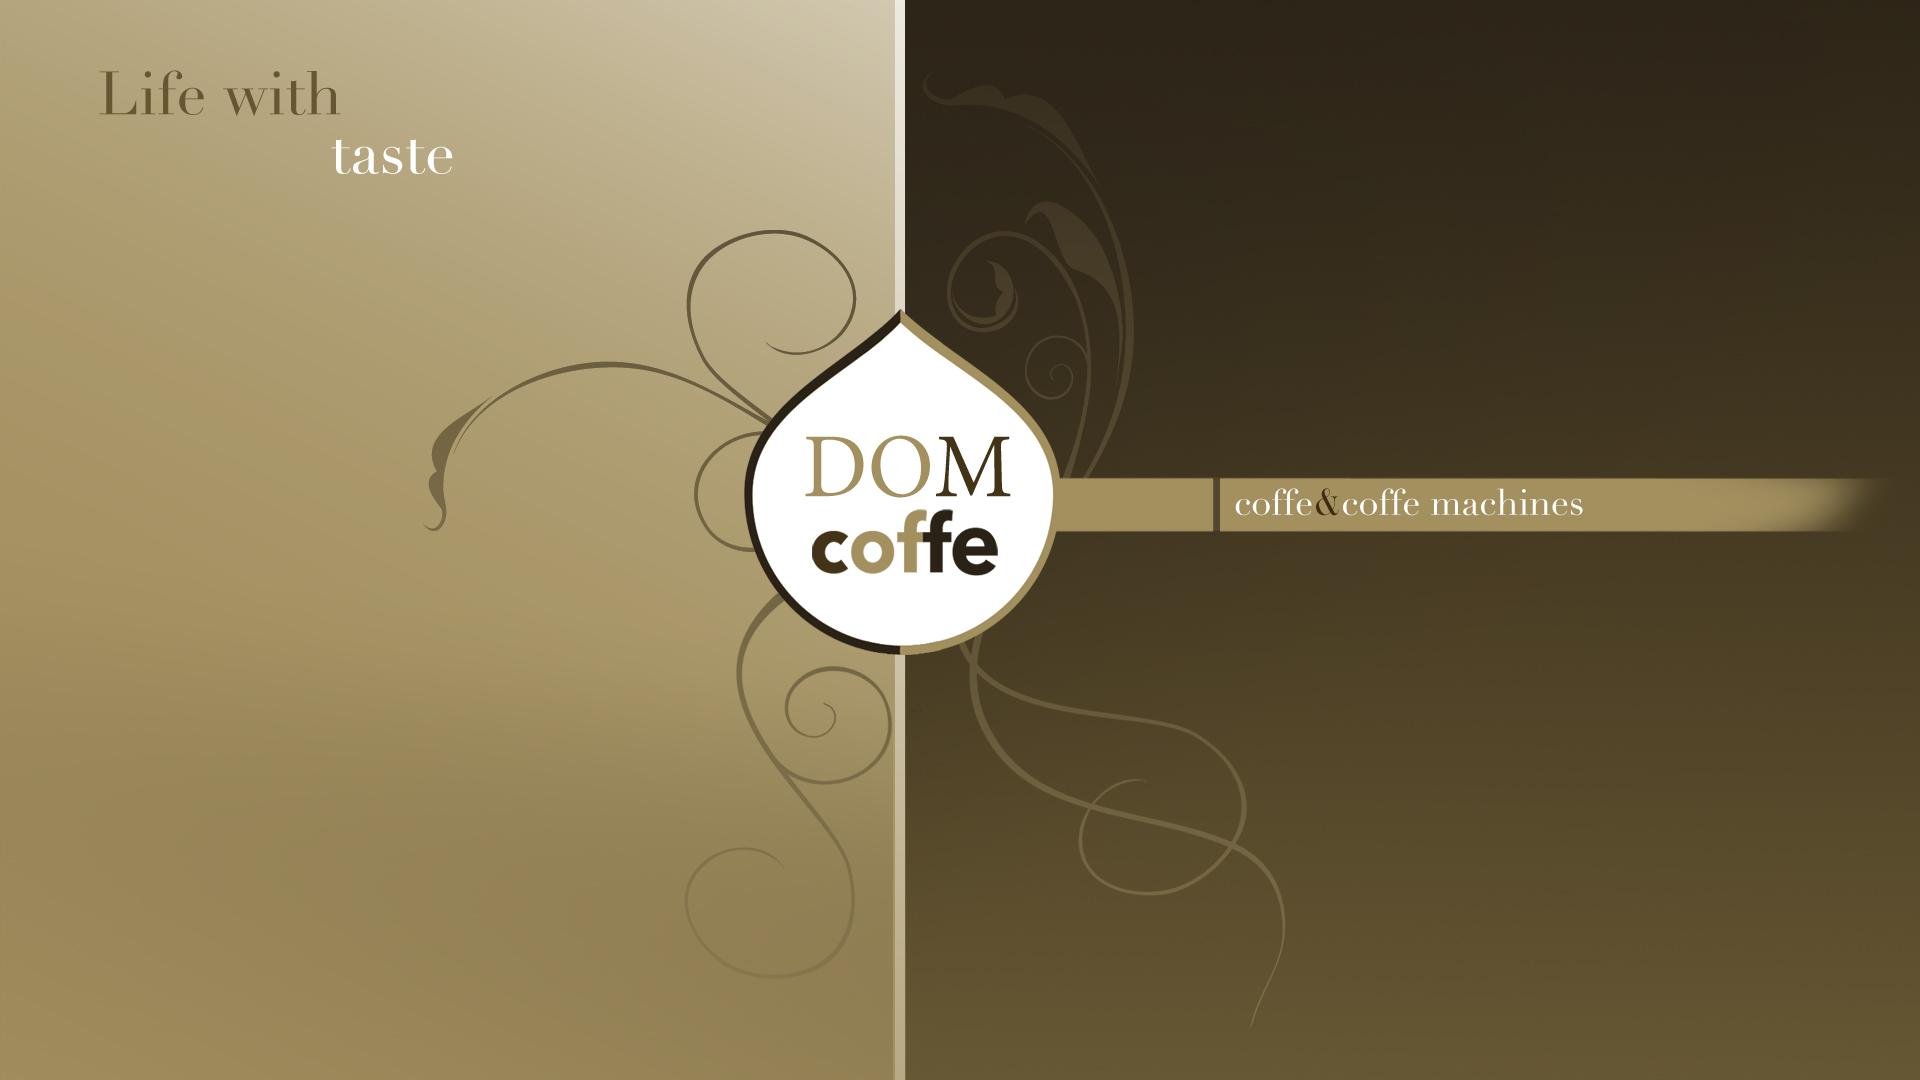 Редизайн логотипа фото f_97853398facb2ff9.jpg